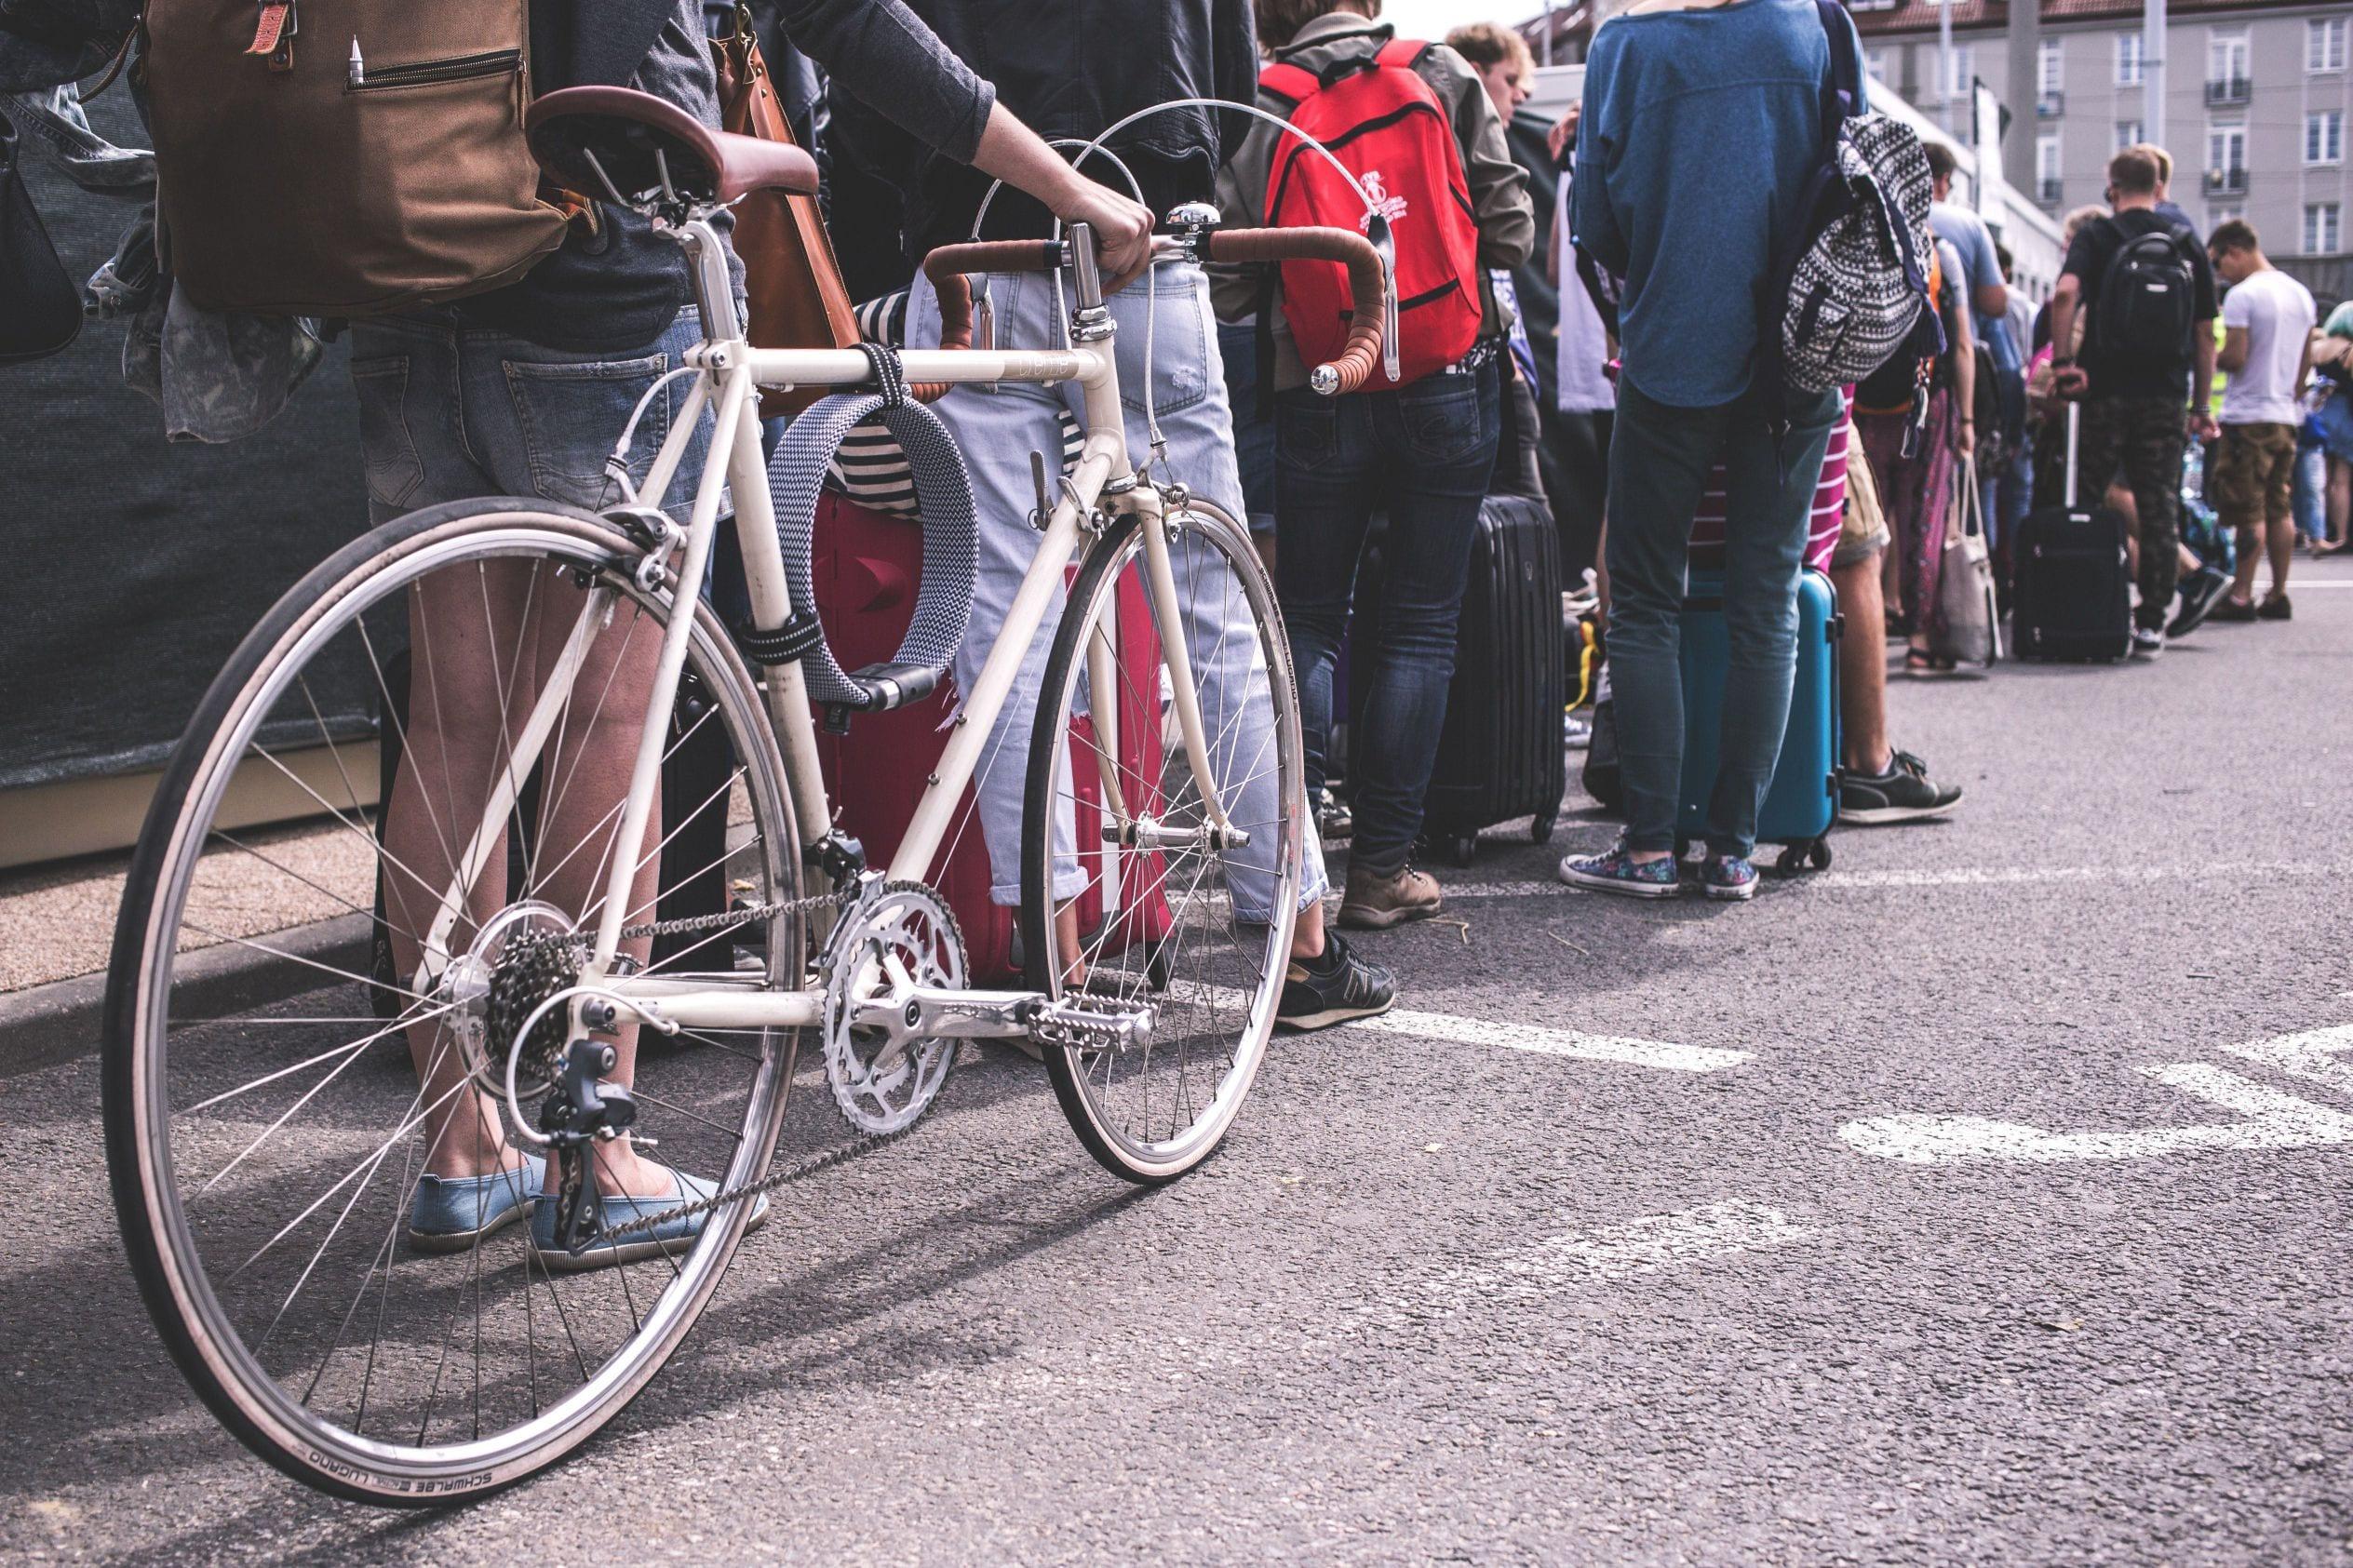 adult-bicycle-bike-122477